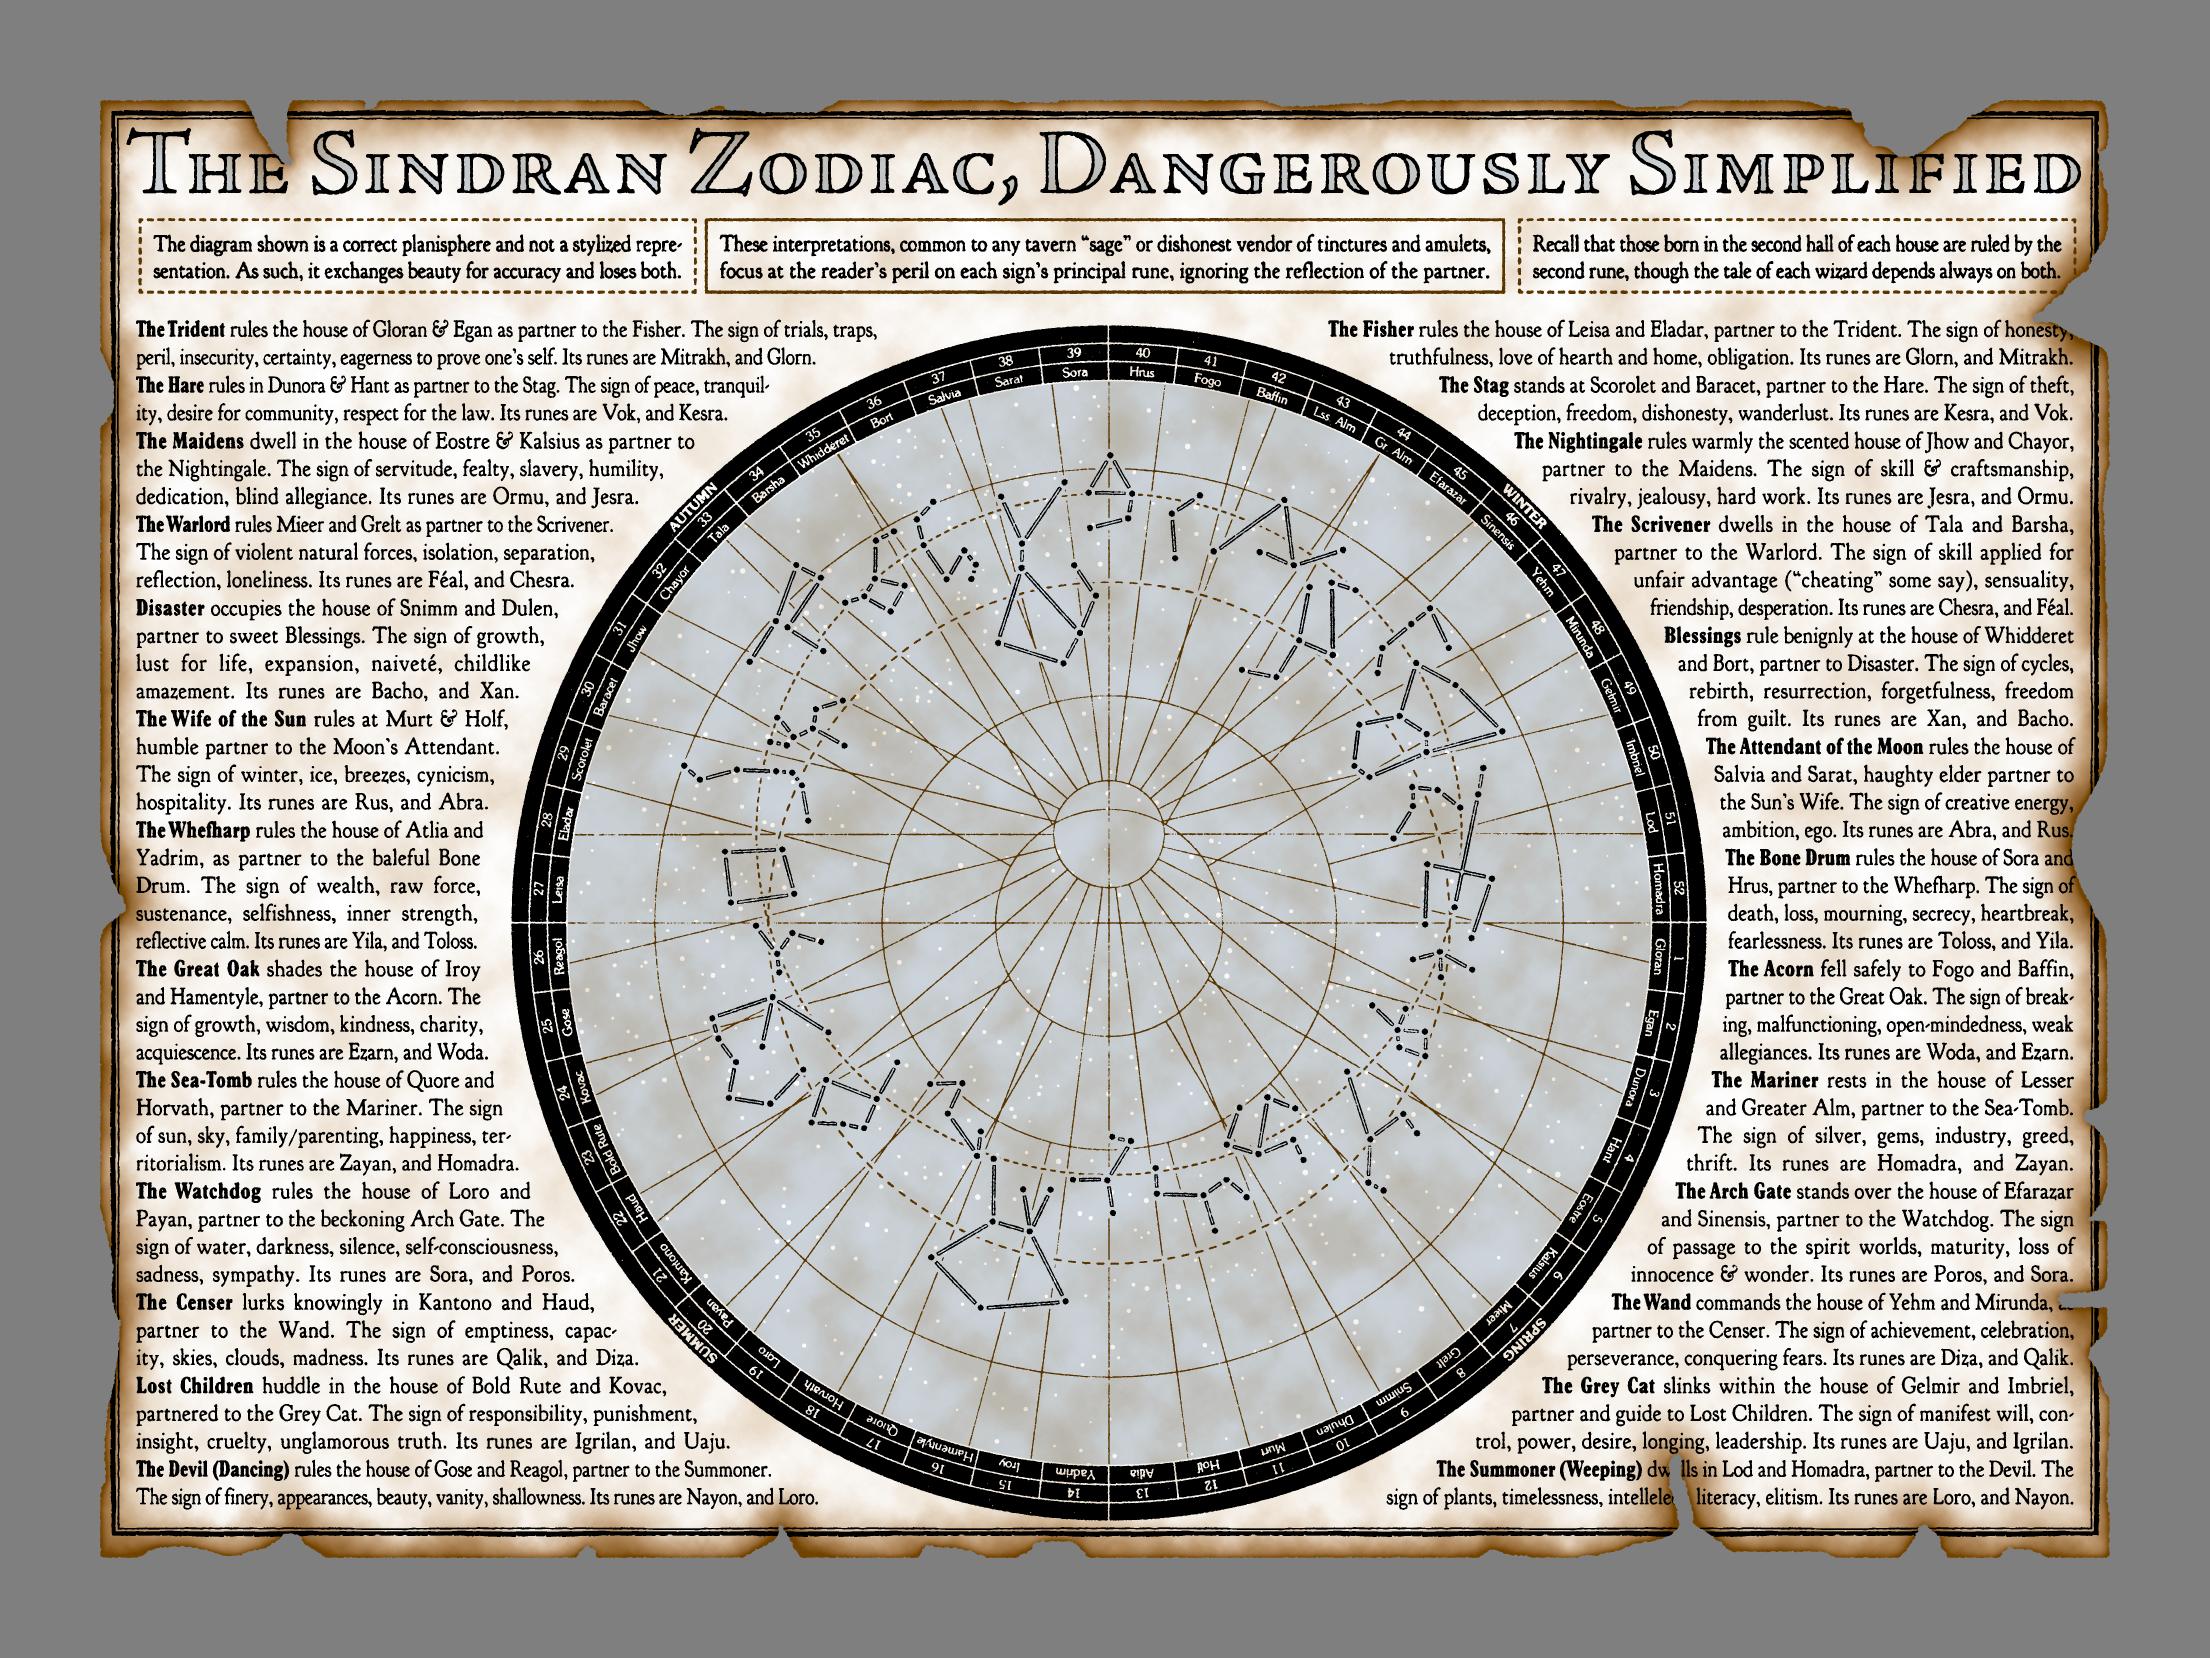 Uresia - The Sindran Zodiac